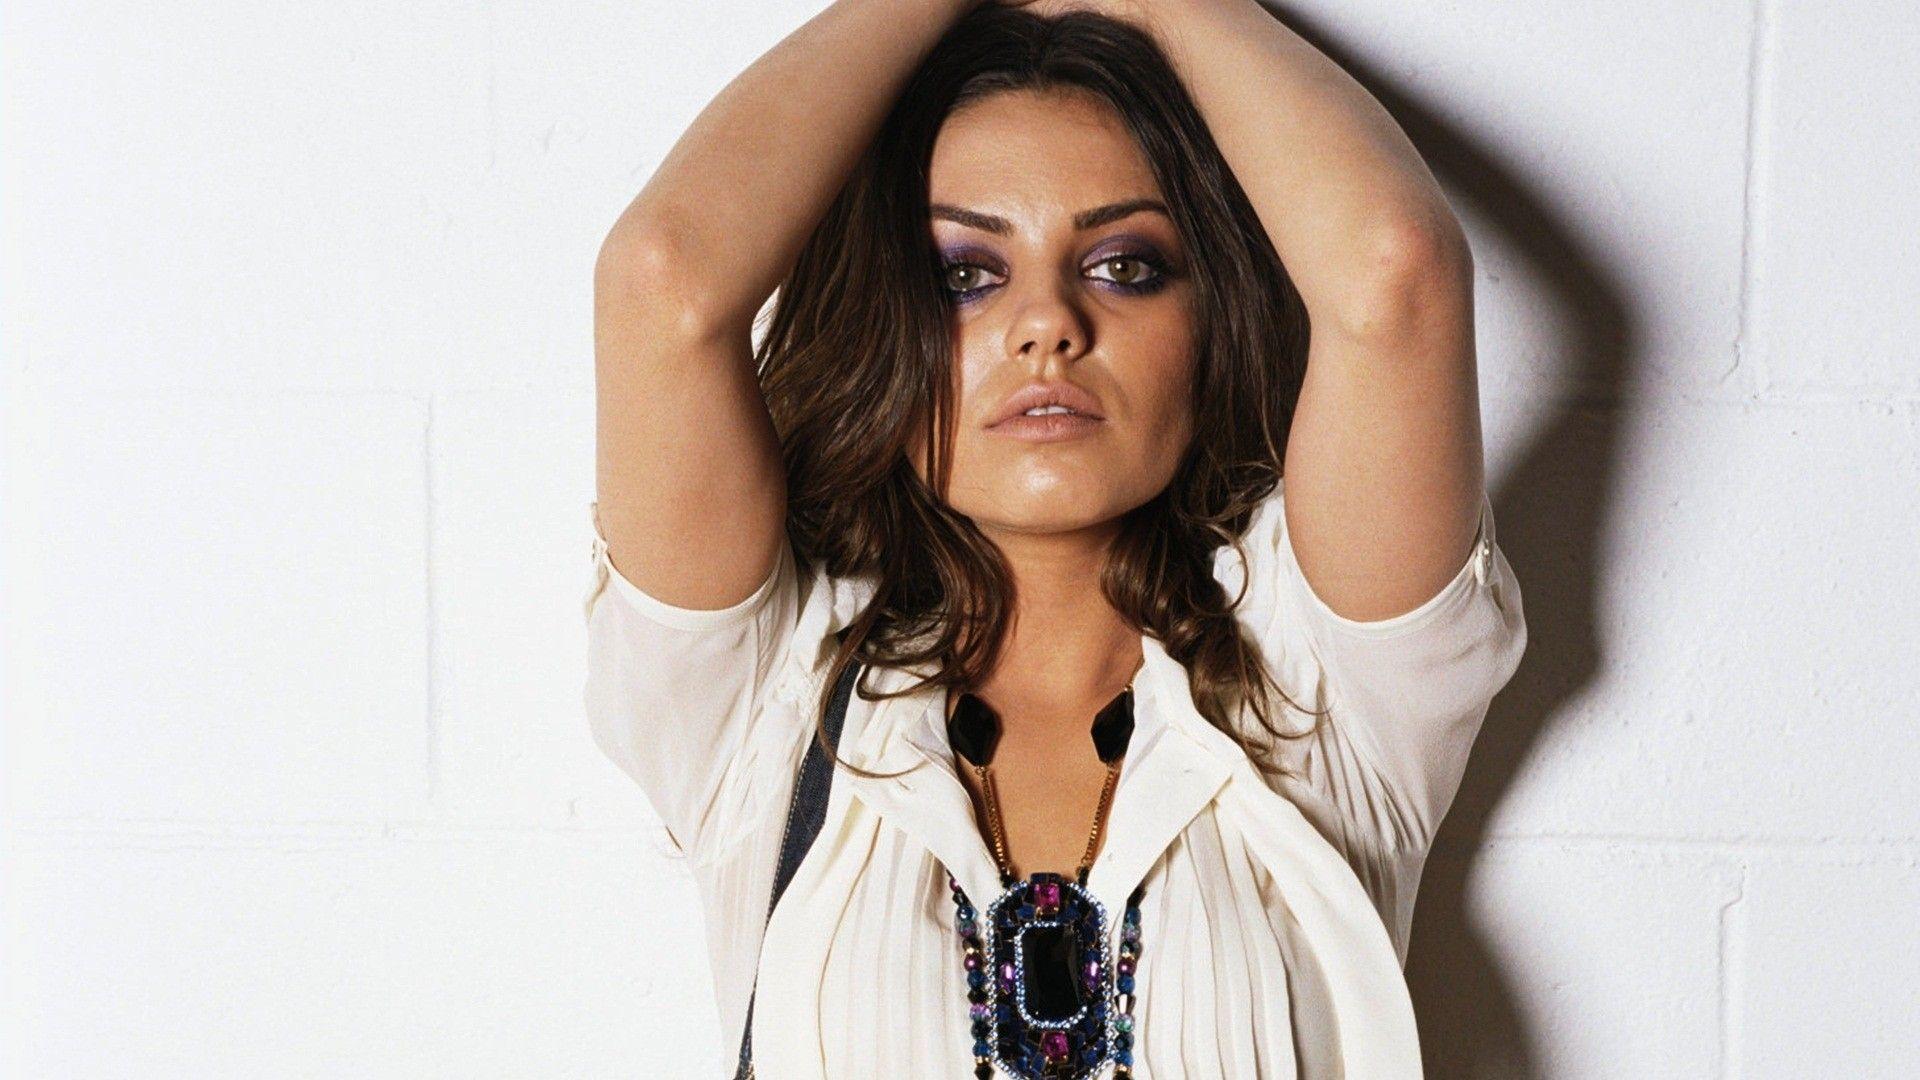 Best Mila Kunis Wallpaper 02 | hdwallpapers-